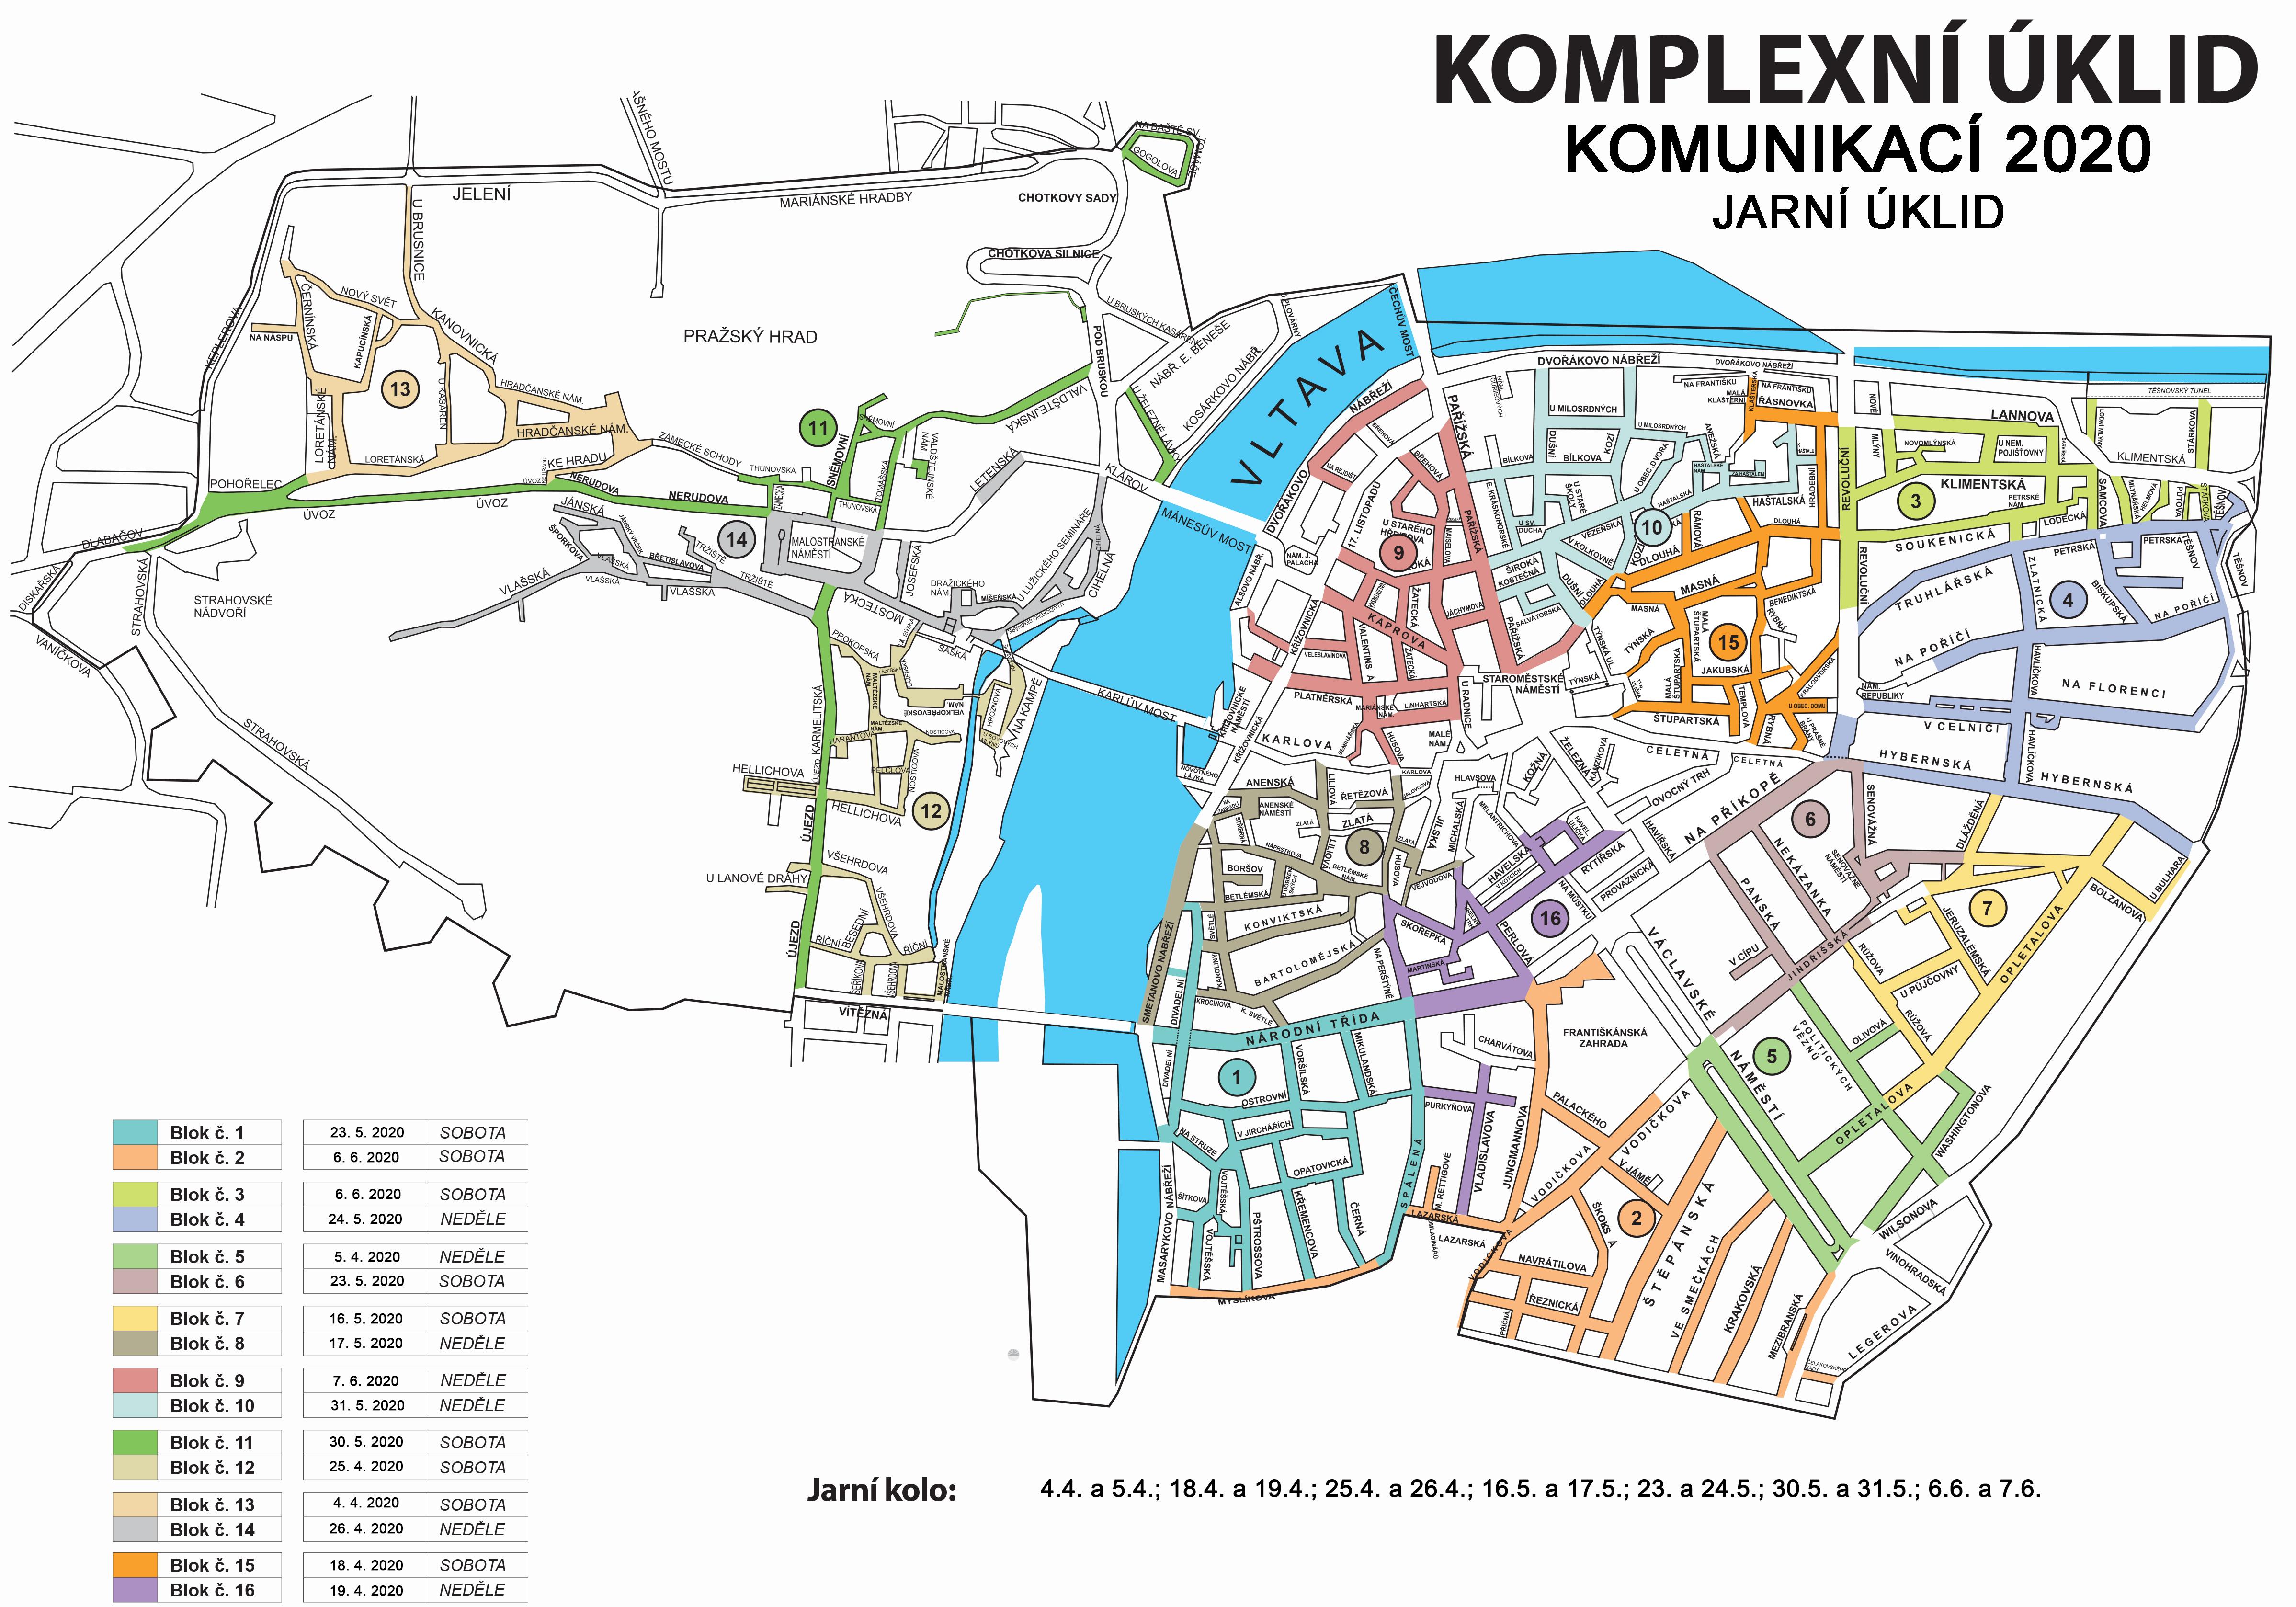 Komplexni Uklid Komunikaci Jaro 2020 Praha 1